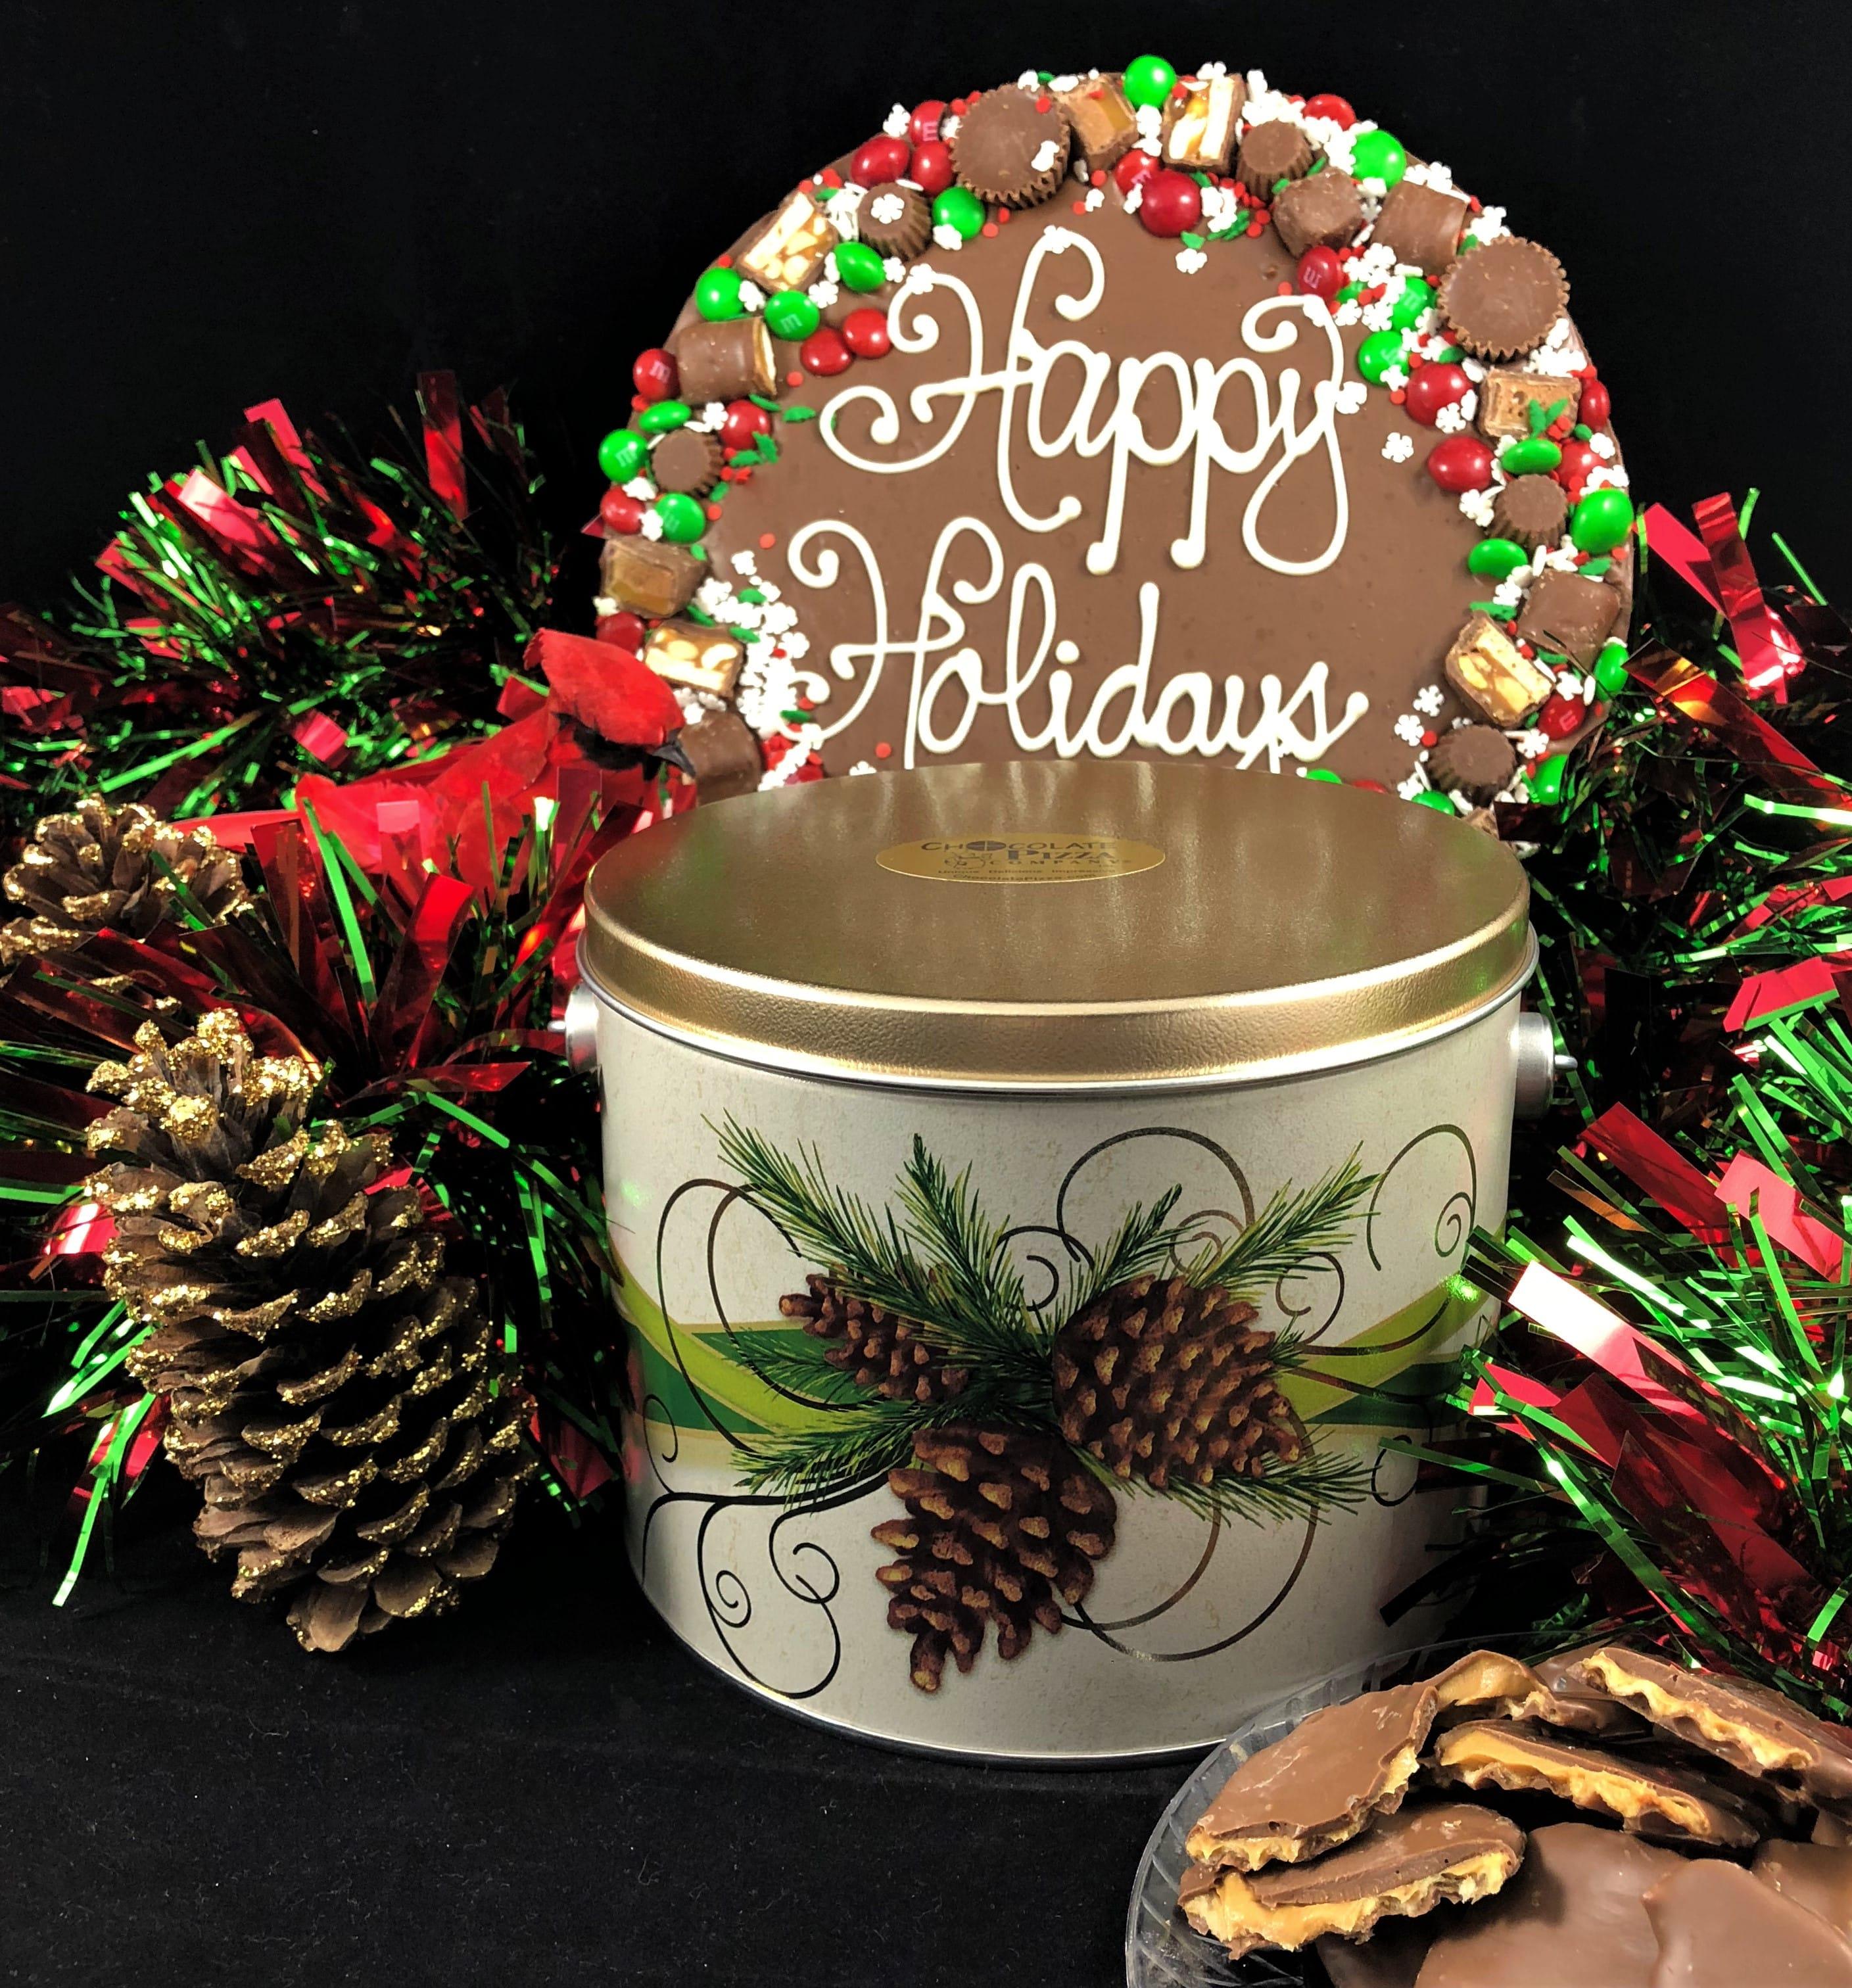 combo happy holidays chocolate